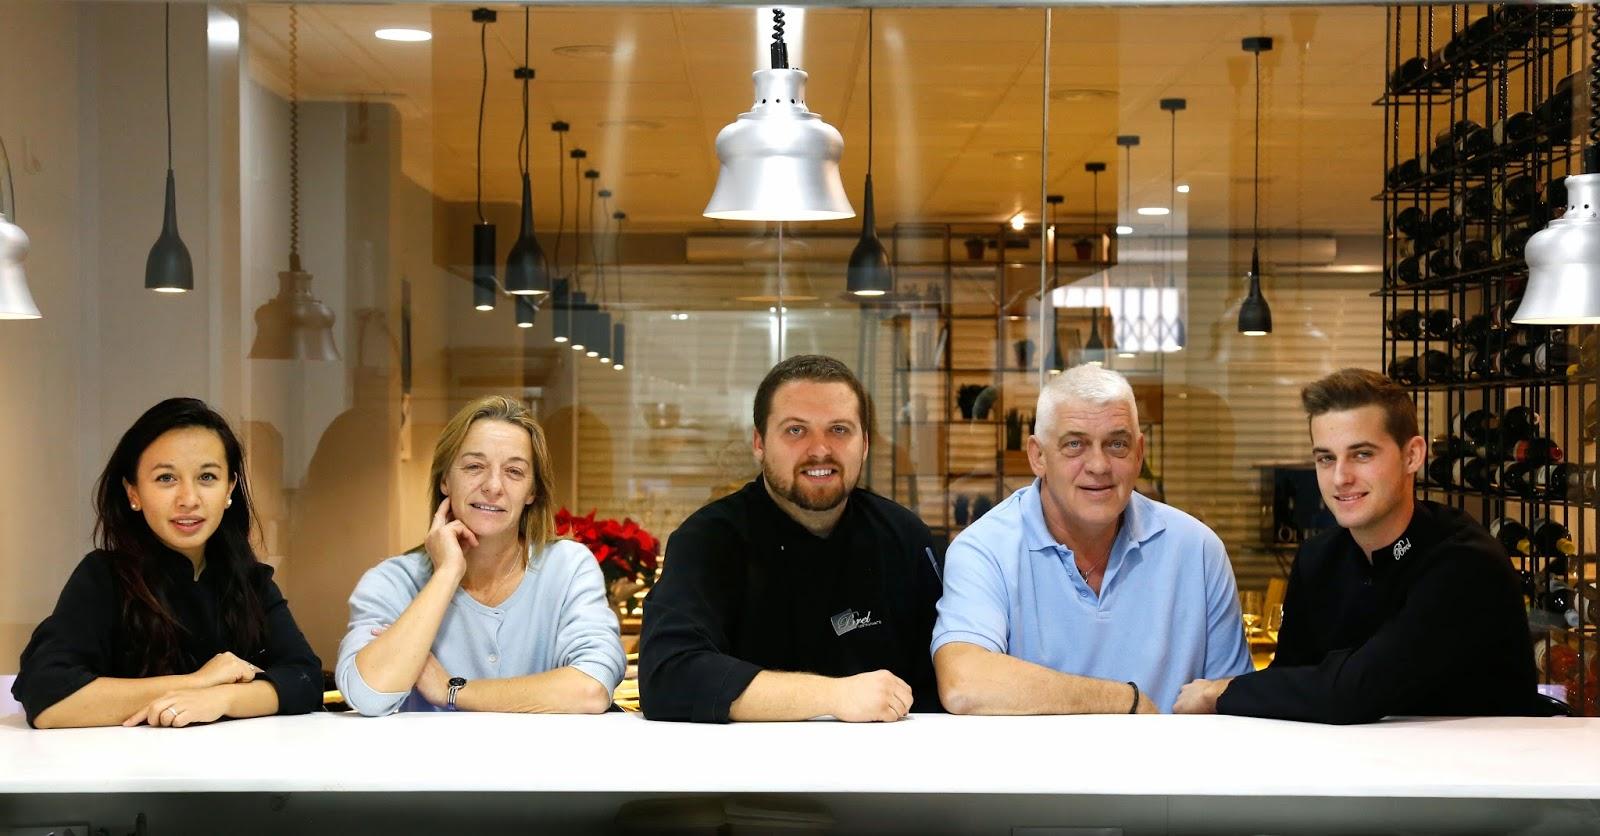 Familia Rome - Restaurante Brel